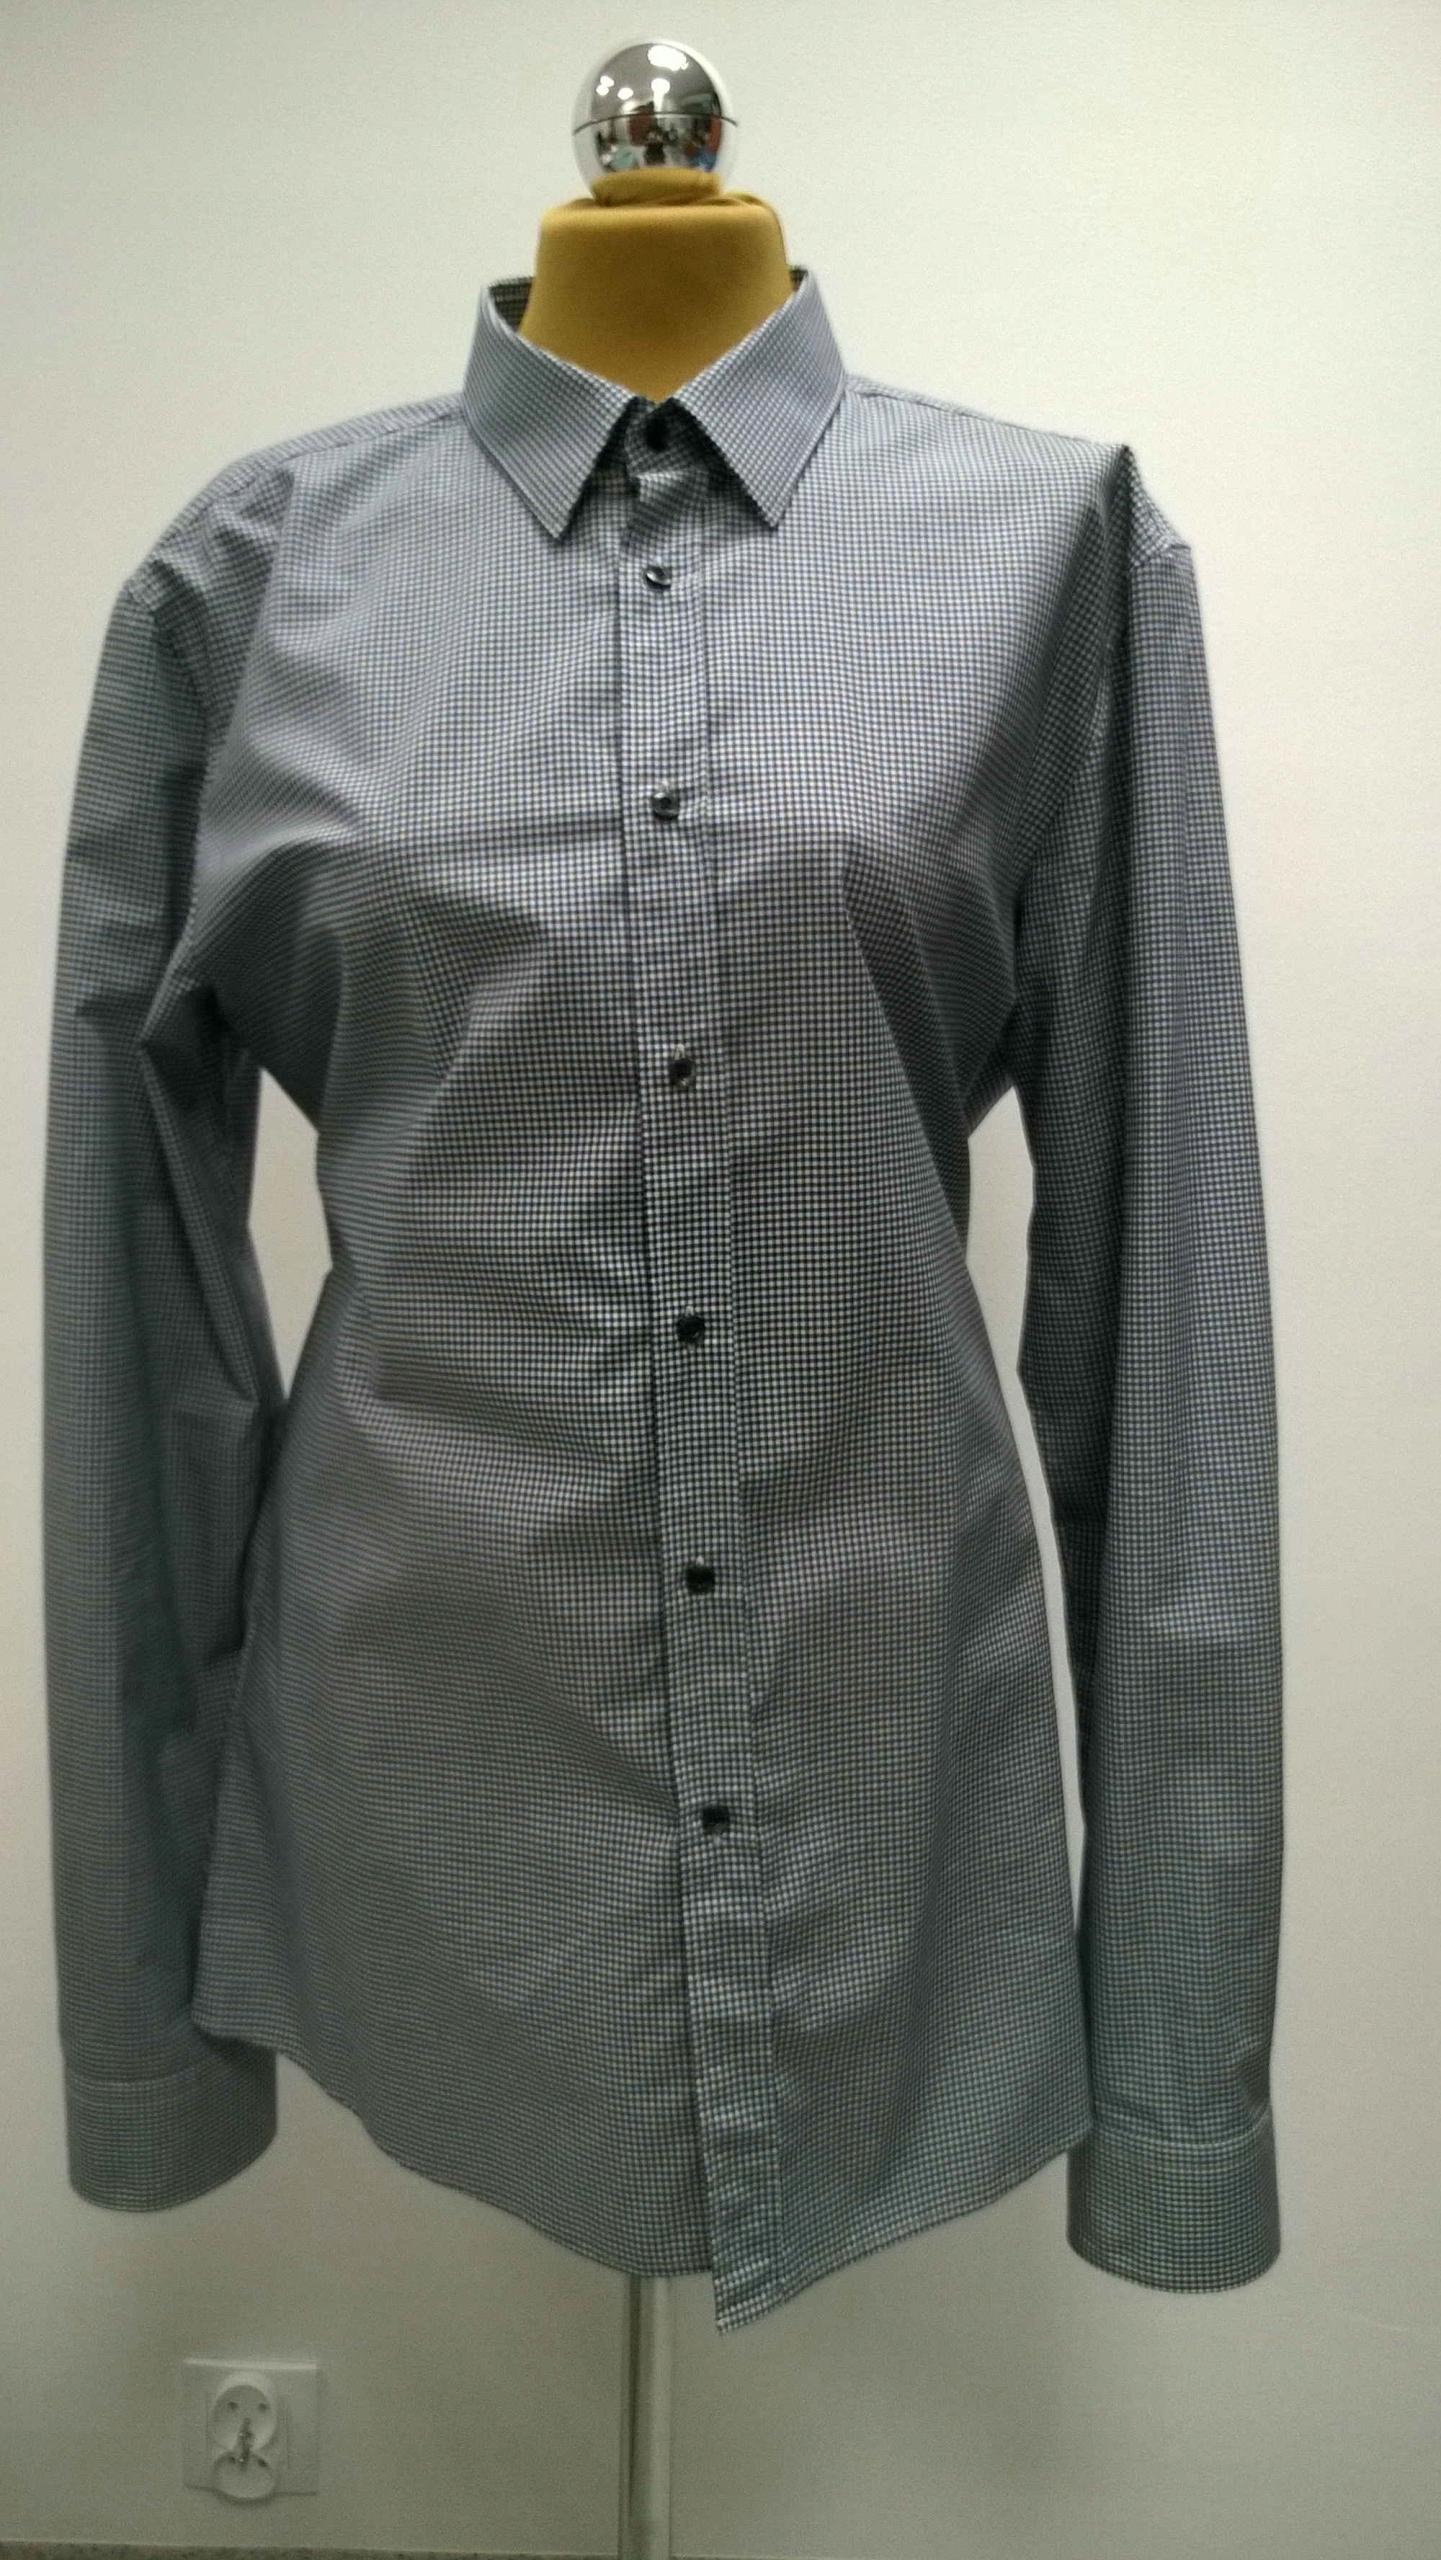 HUGO BOSS koszula Slim Fit XL męska